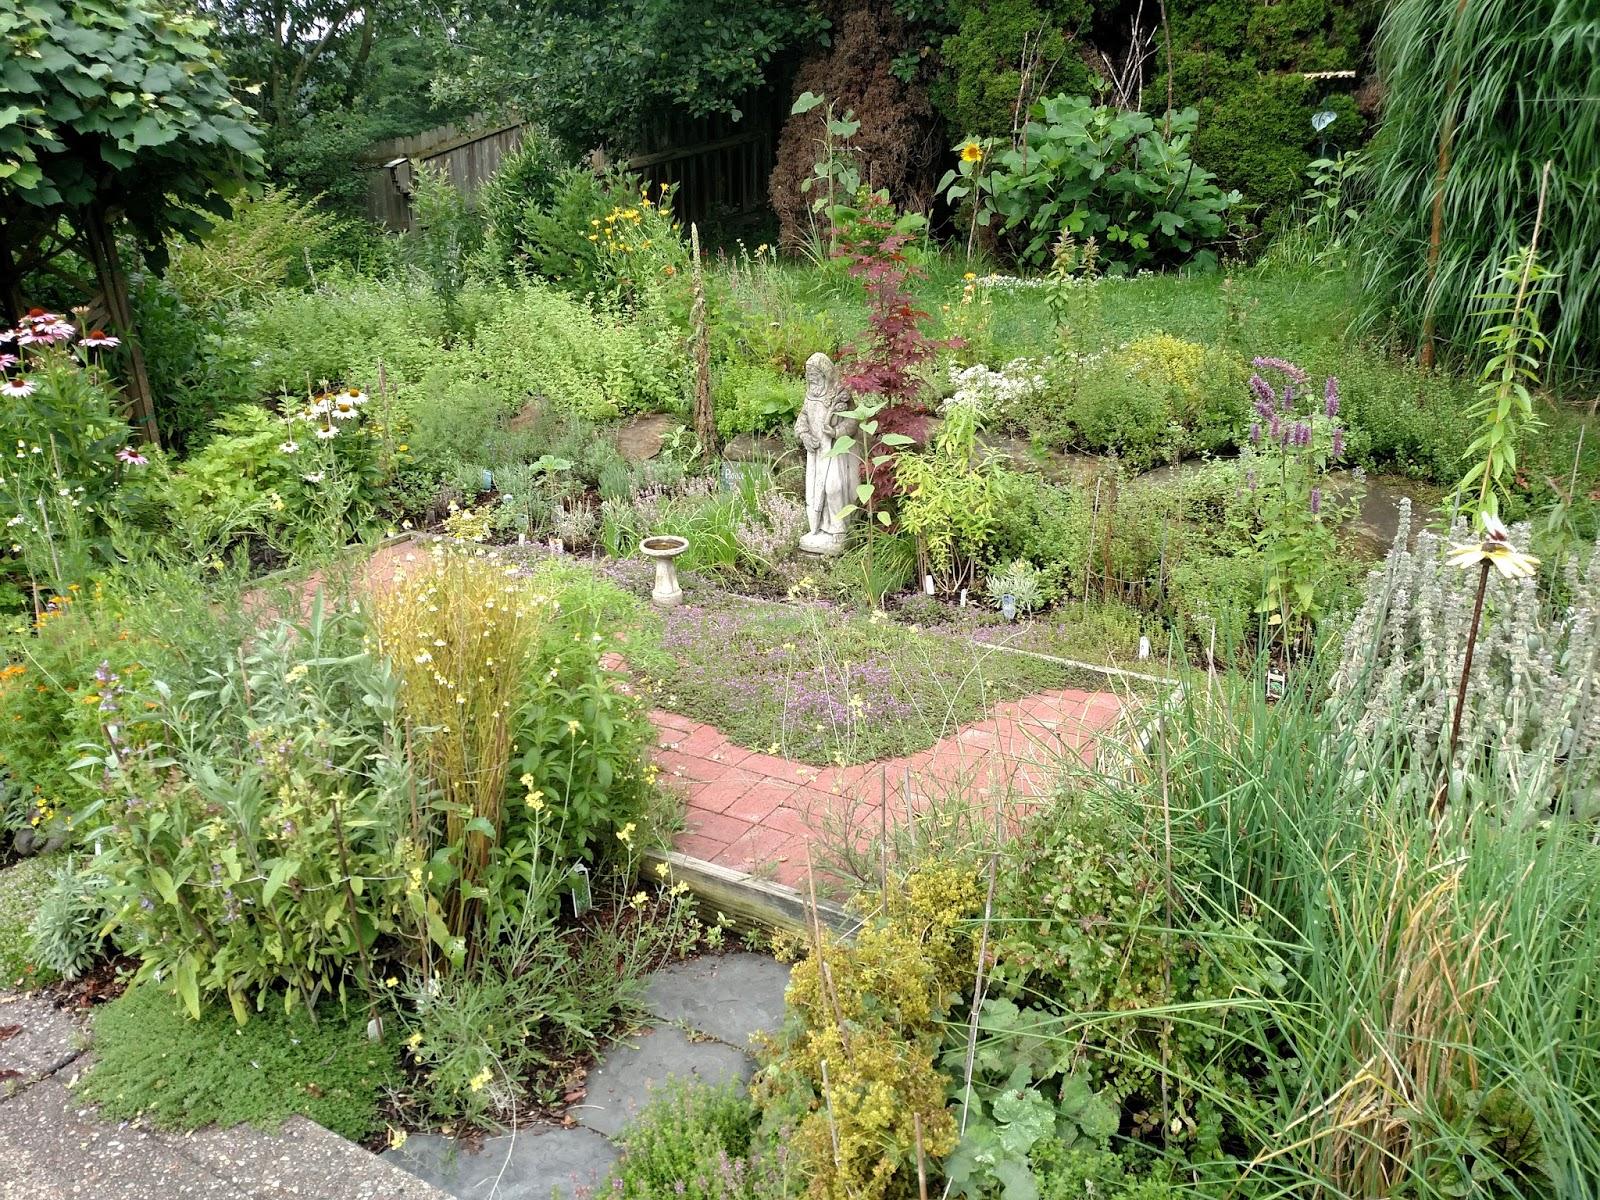 Wild Backyard Herbs : Lemon Verbena Ladys Herb Garden Havent Had Much Thyme to Blog!